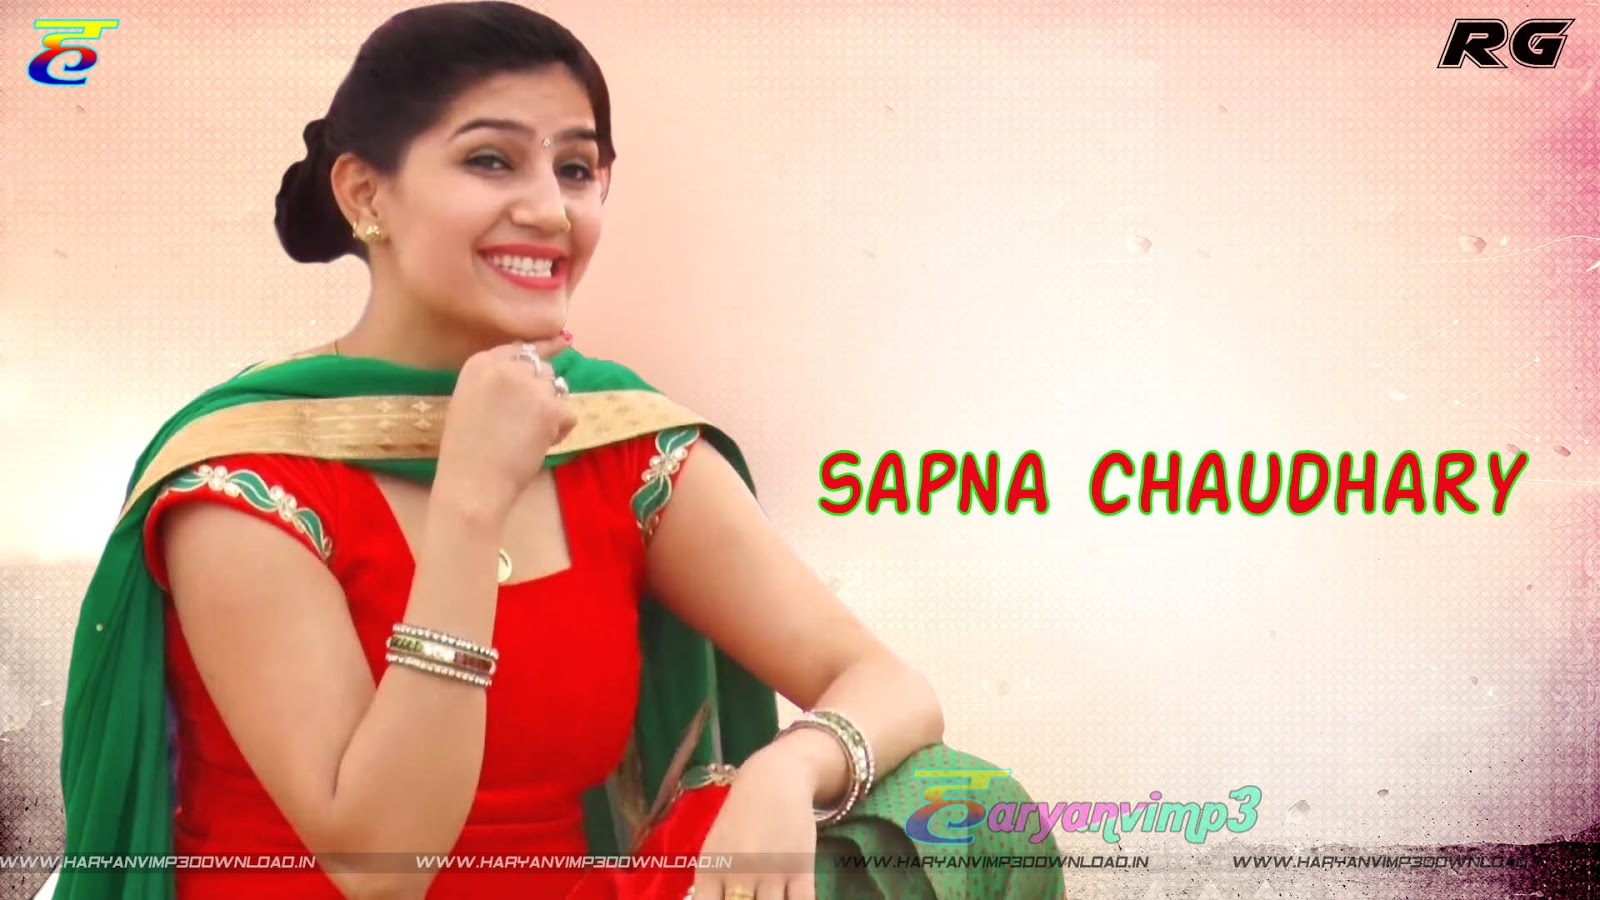 Sapna Choudhary Full HD Wallpaper_2 2016